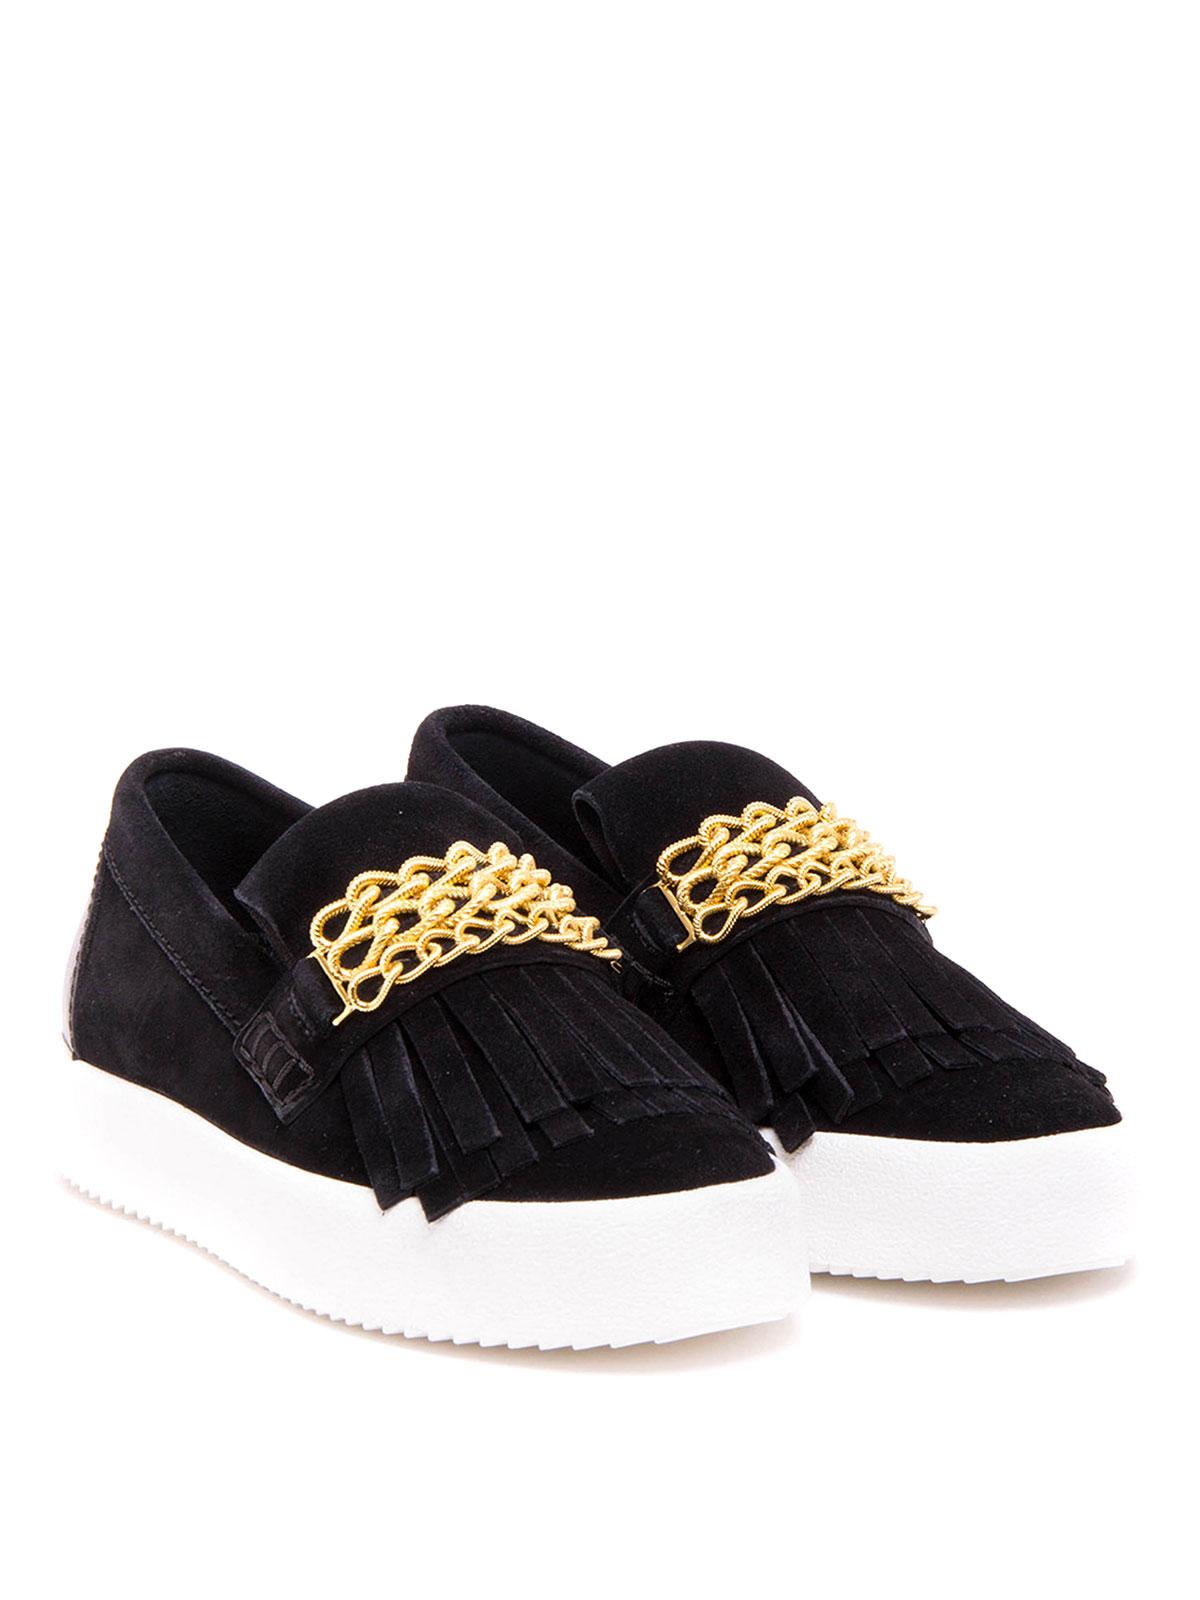 sneaker fur damen schwarz von giuseppe zanotti sneaker. Black Bedroom Furniture Sets. Home Design Ideas